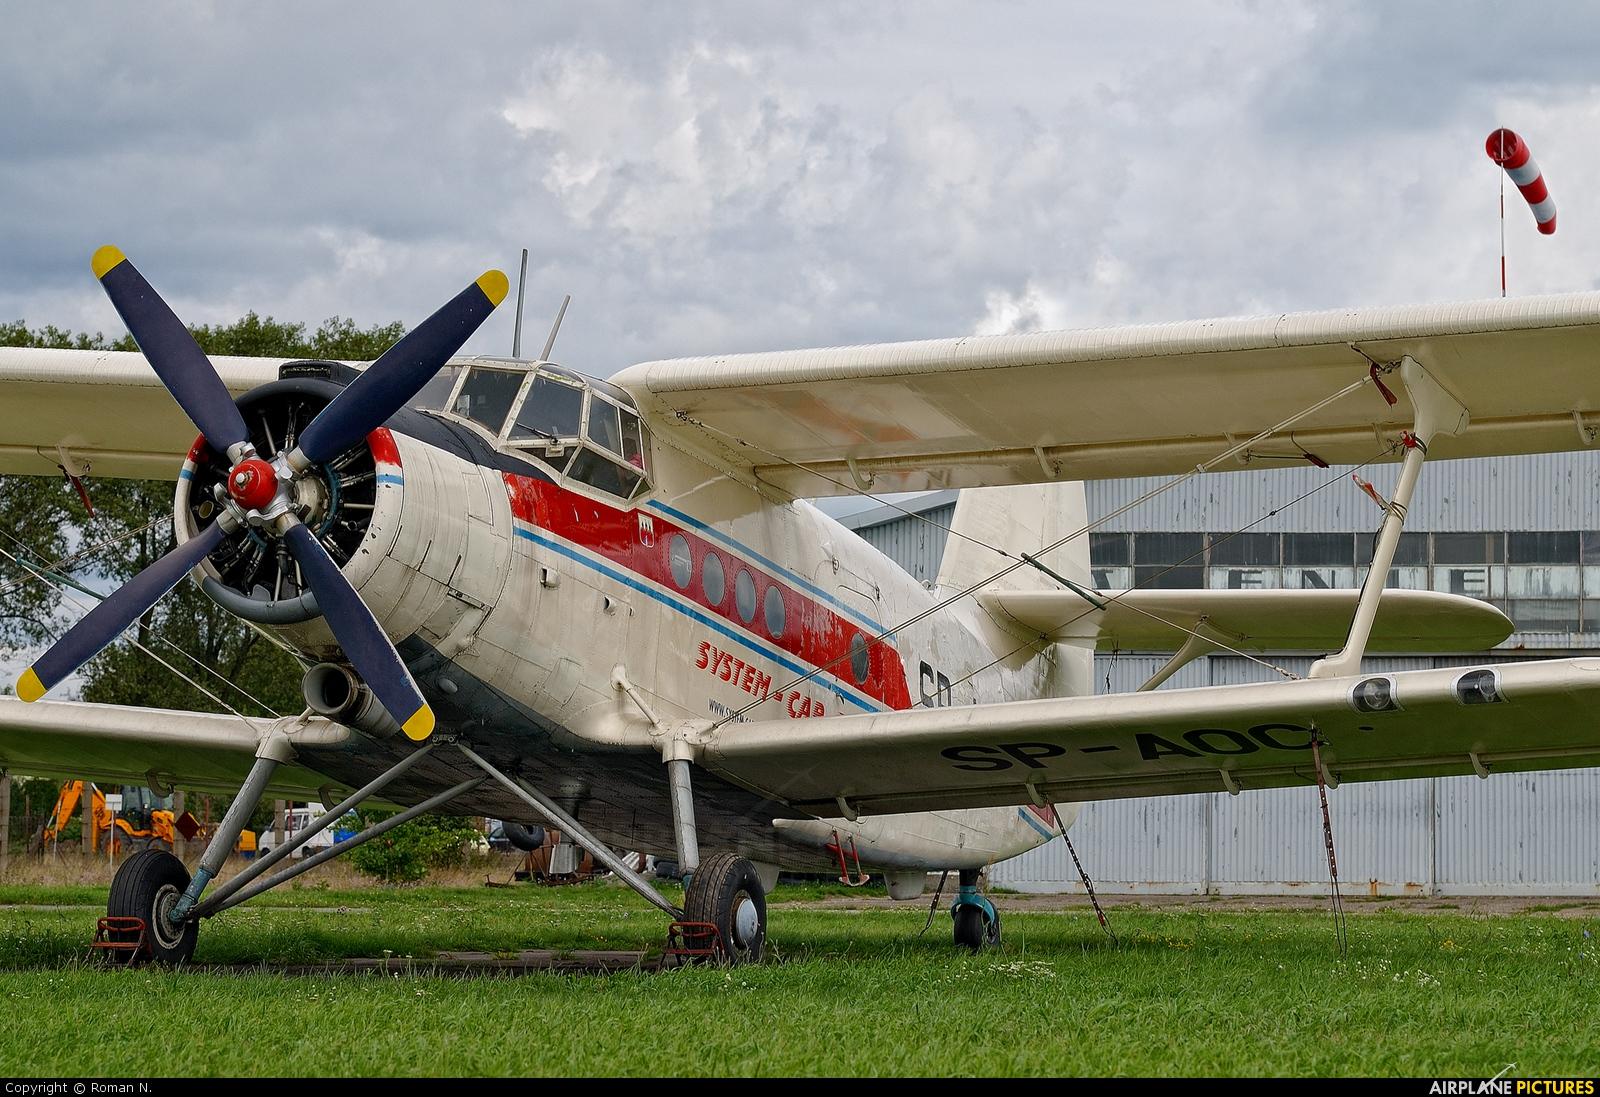 Aeroklub Bydgoski SP-AOC aircraft at Bydgoszcz - Szwederowo